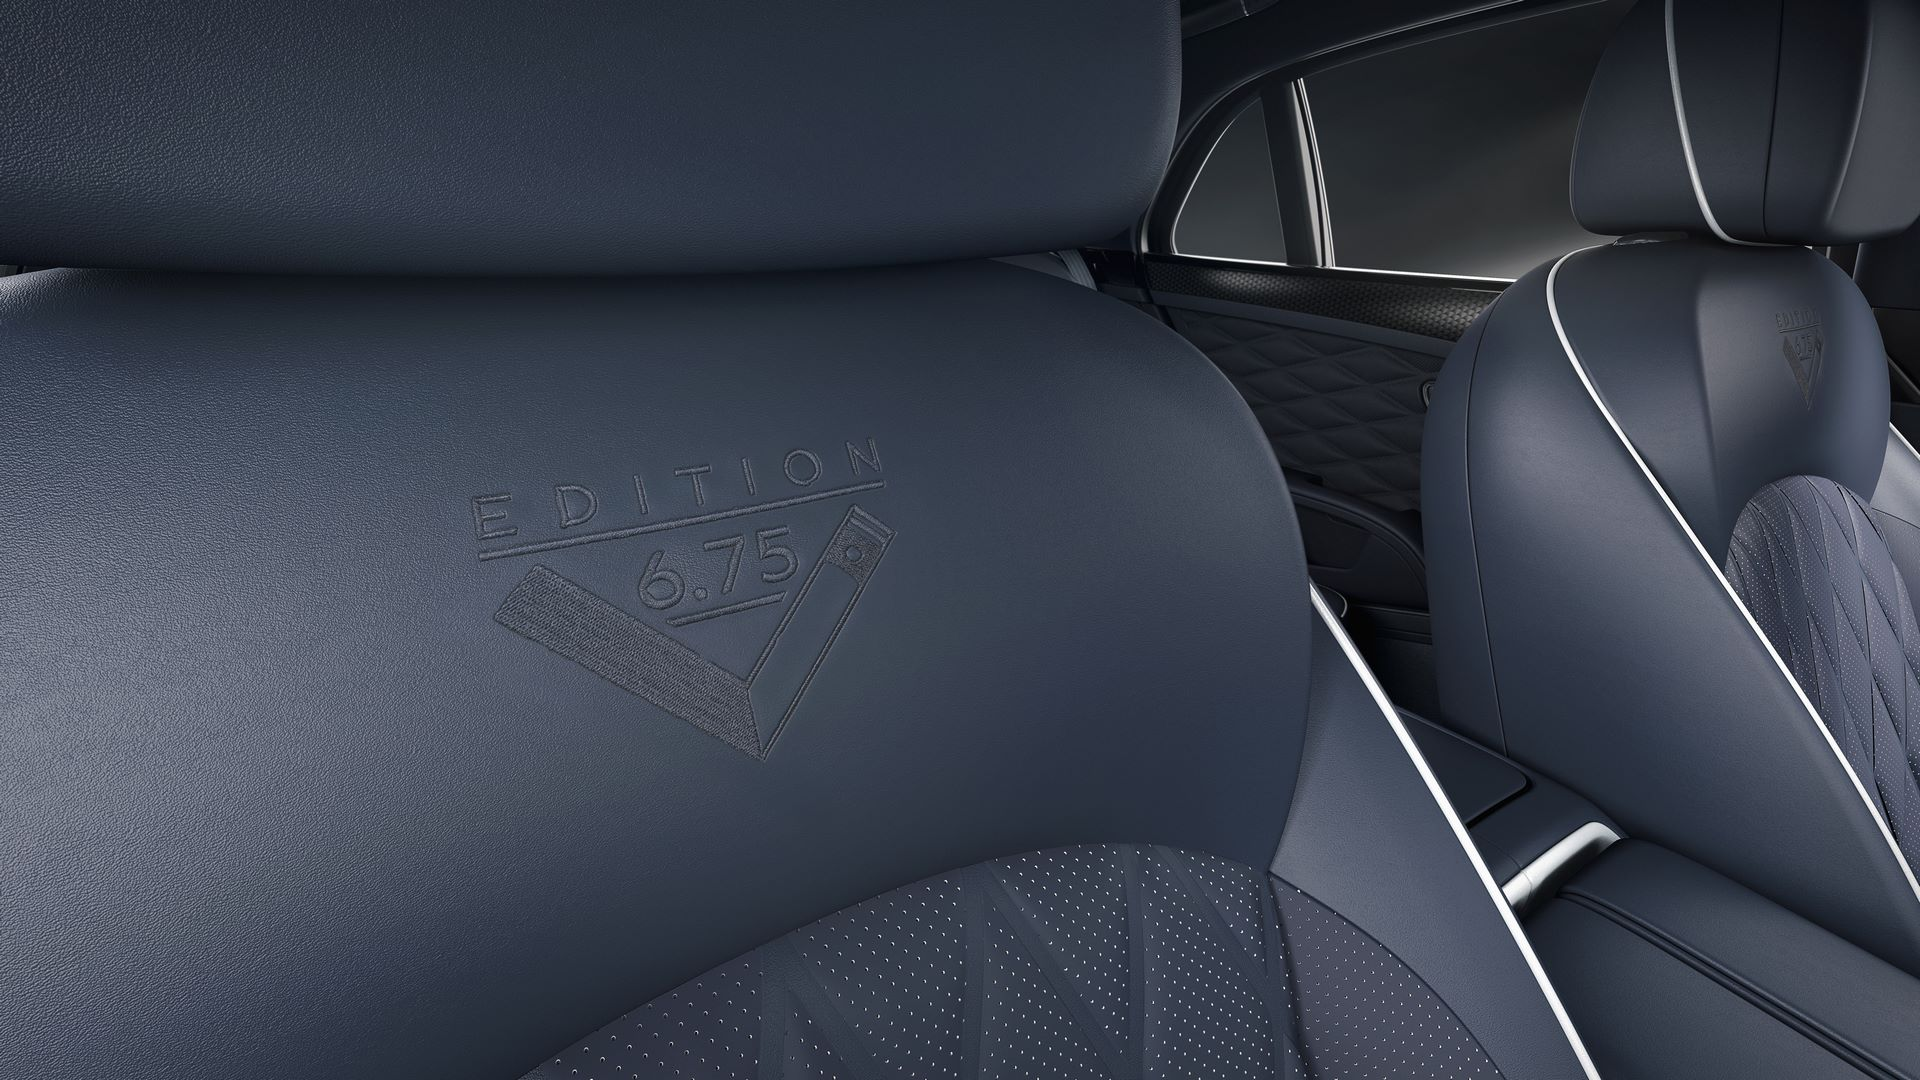 Bentley-Mulsanne-6.75-Edition-By-Mulliner-13